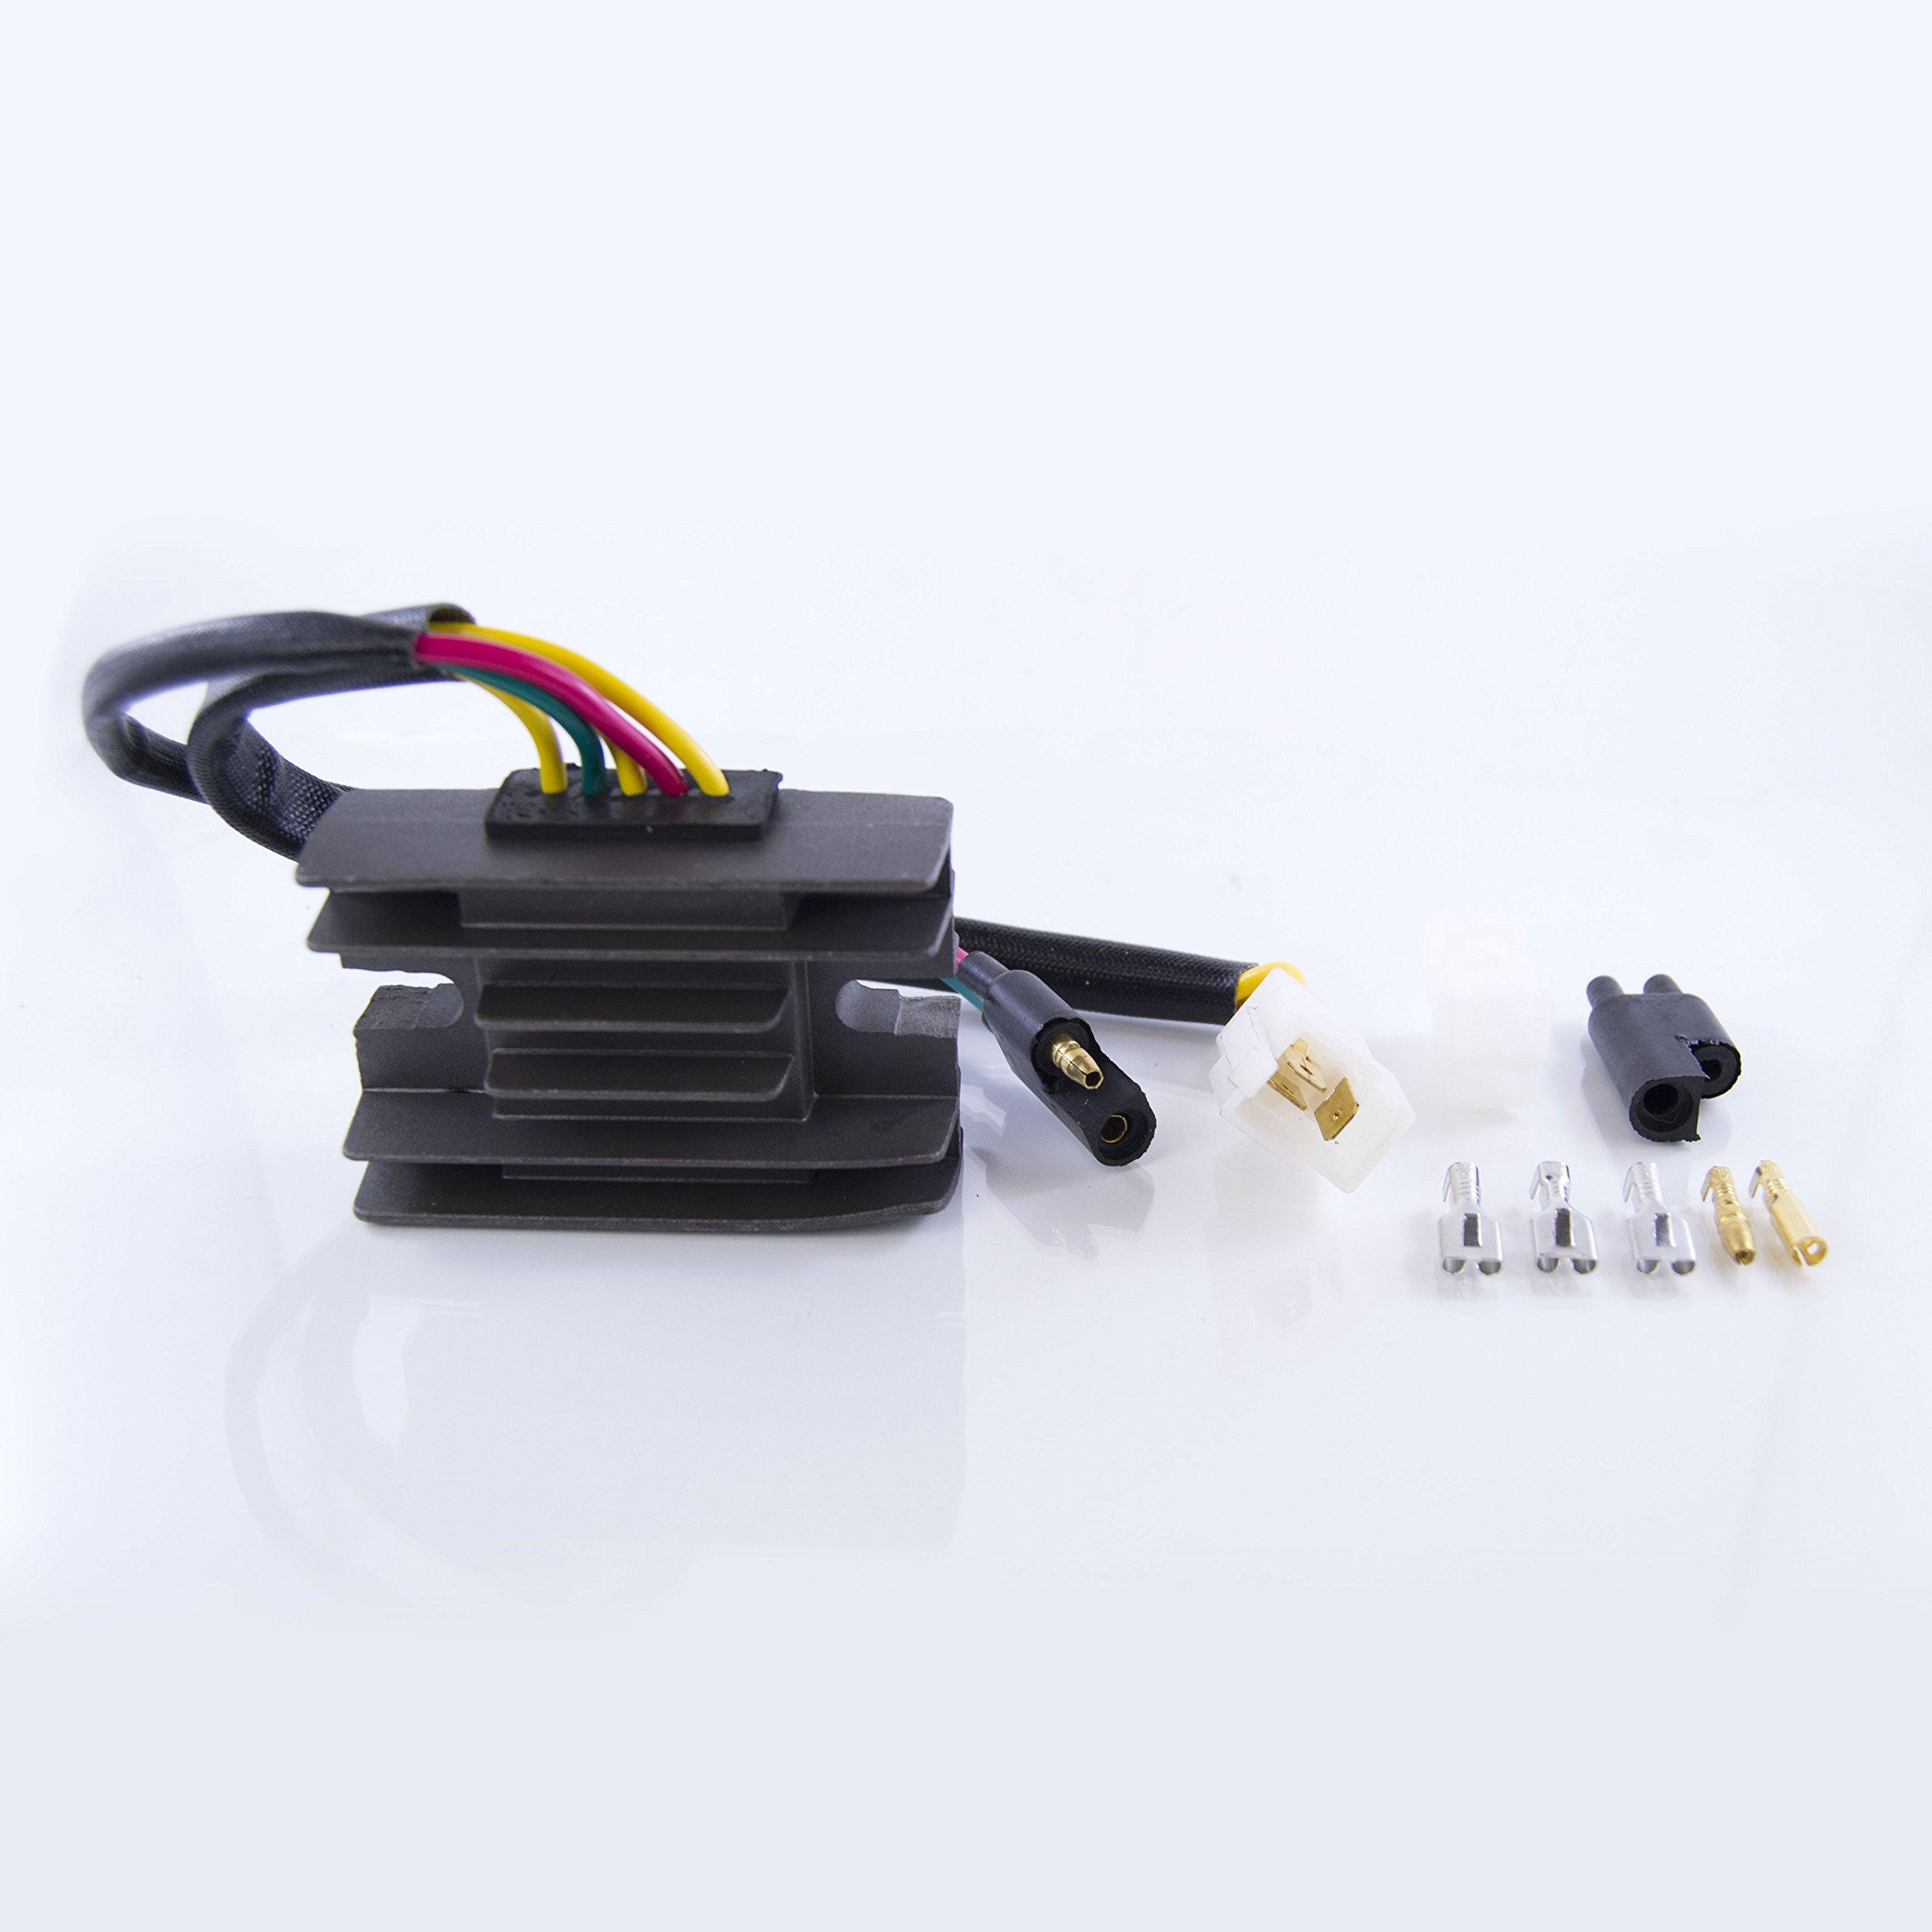 Voltage Regulator Rectifier For Arctic Cat 400 500 2x4 / 4x4 / Manual 2000 2001 OEM Repl.# 0530-006 0530-137 by RMSTATOR